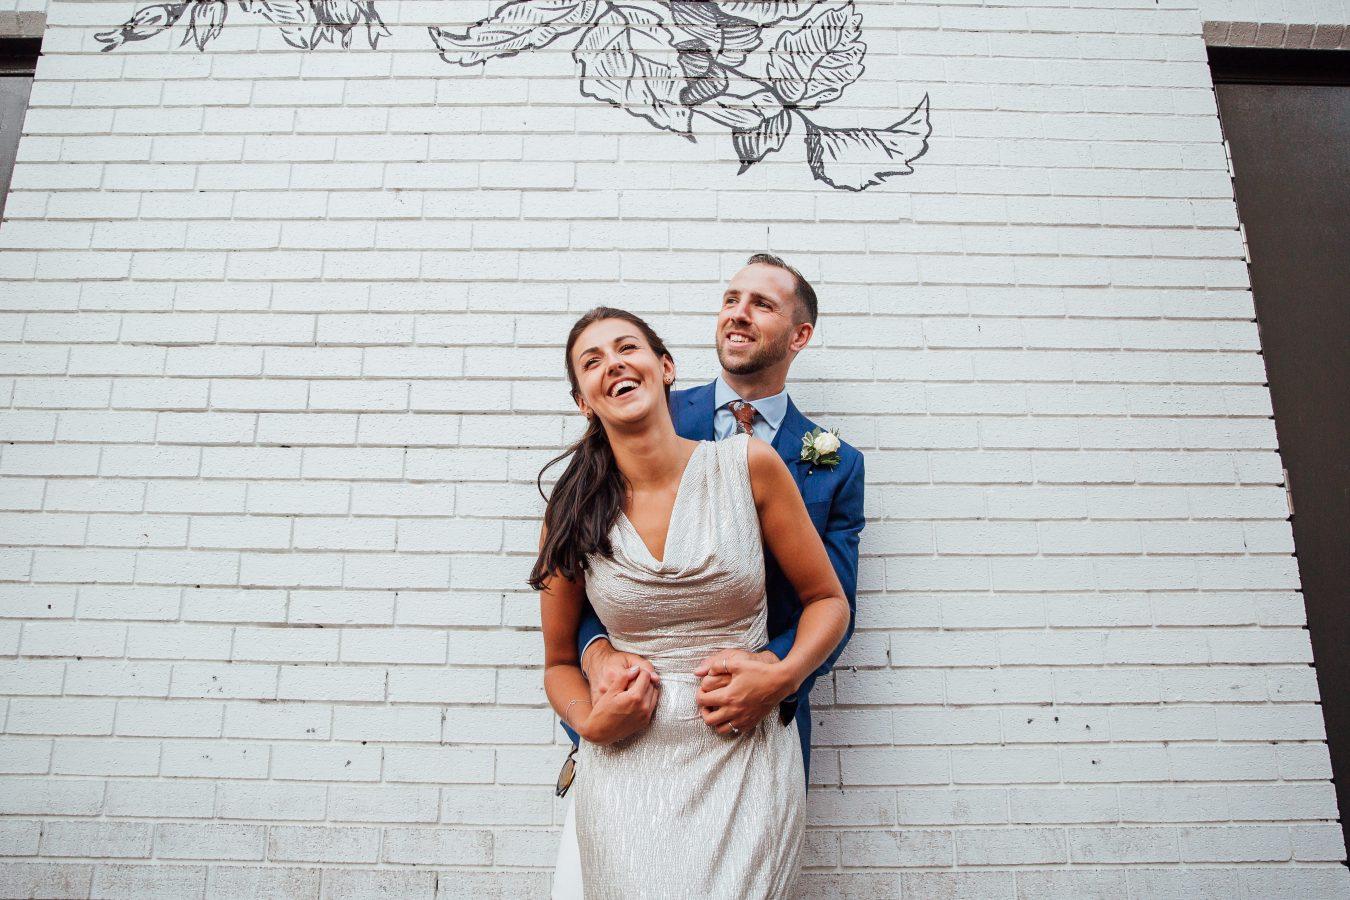 Laura-George-Jules-Barron-Leeds-Inner-City-Wedding-2018-868